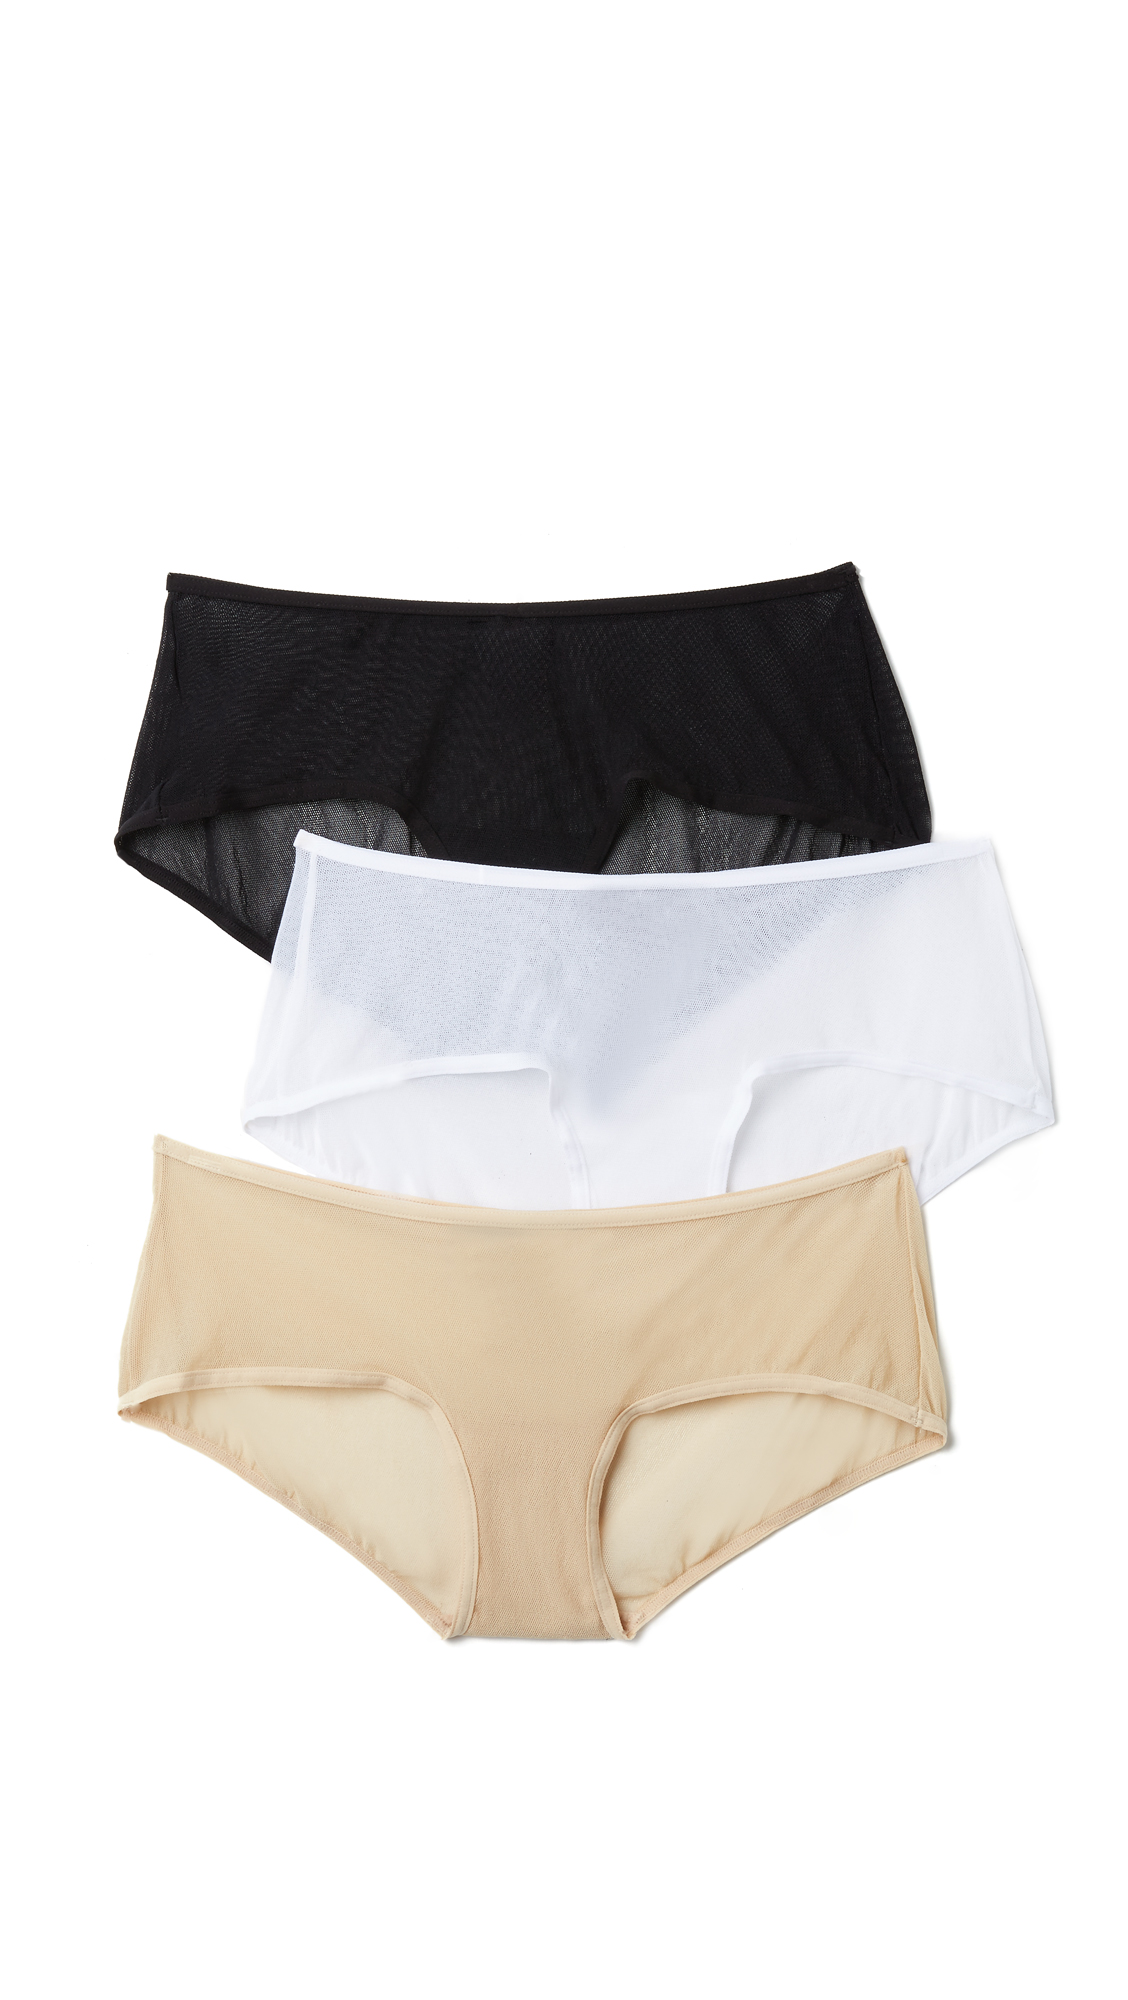 Cosabella Soire Boyshorts 3 Pack In Black/White/Blush